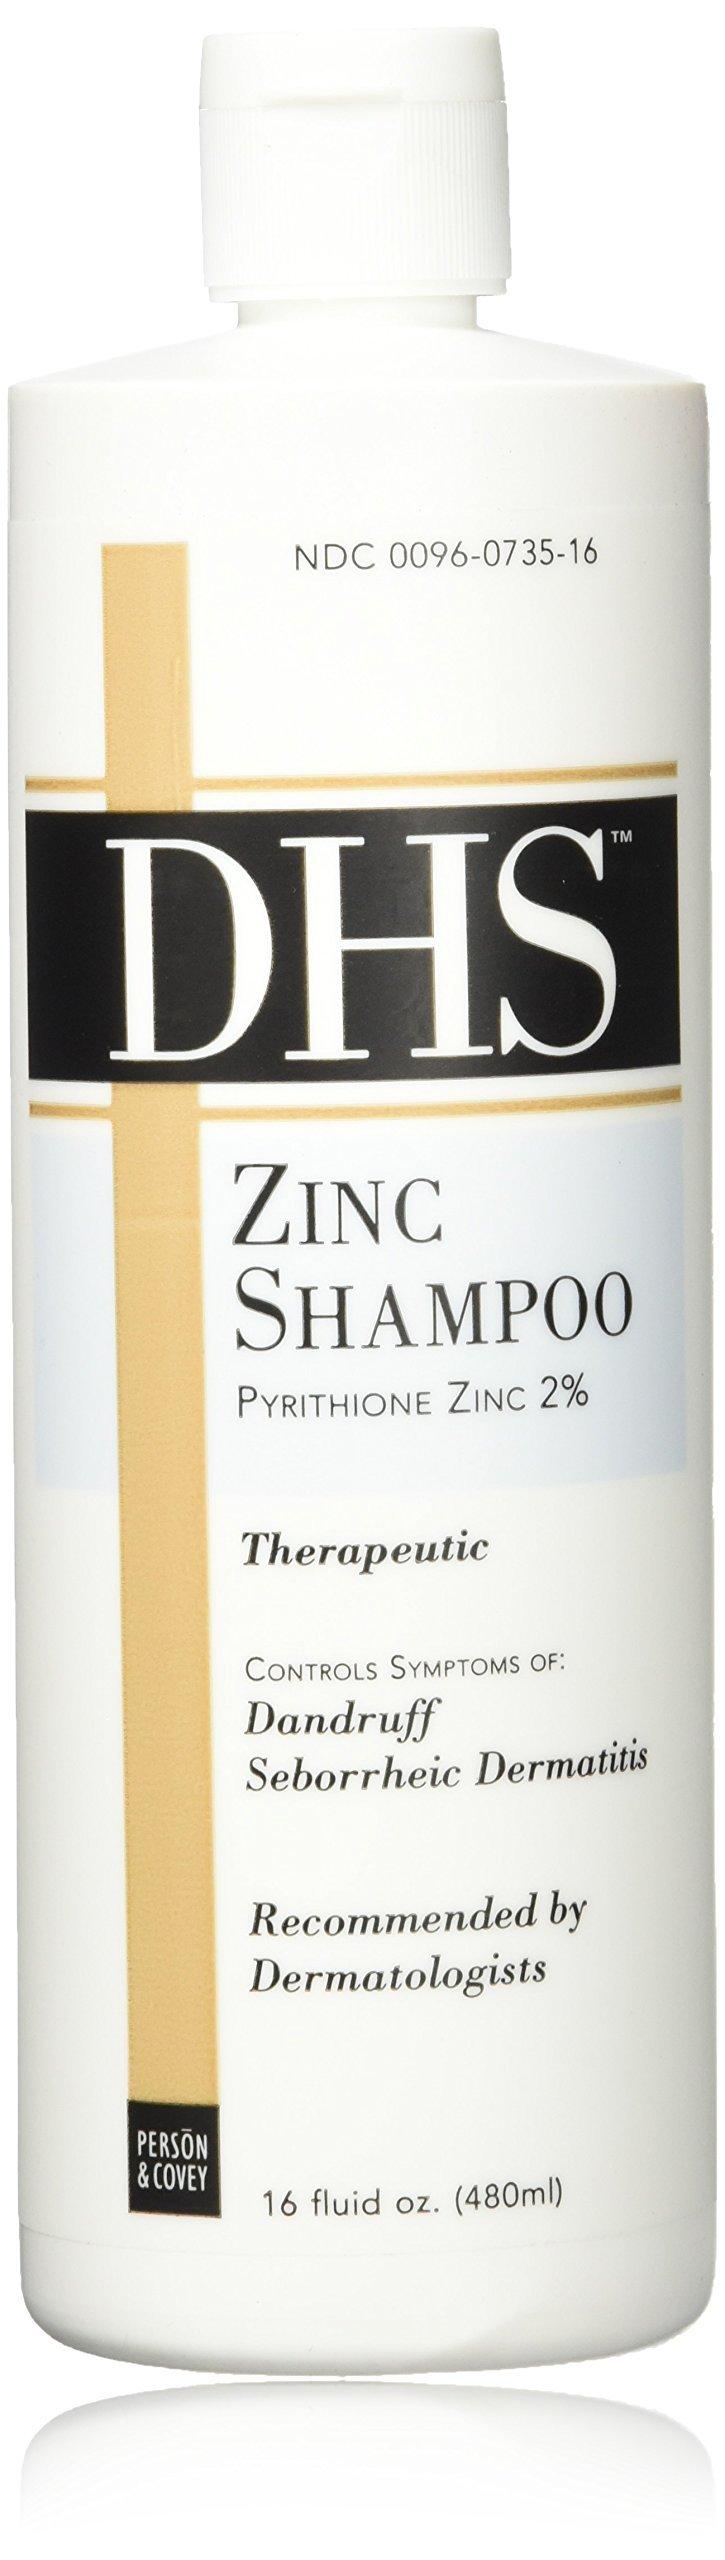 Zinc Shampoo, Dhs 16oz